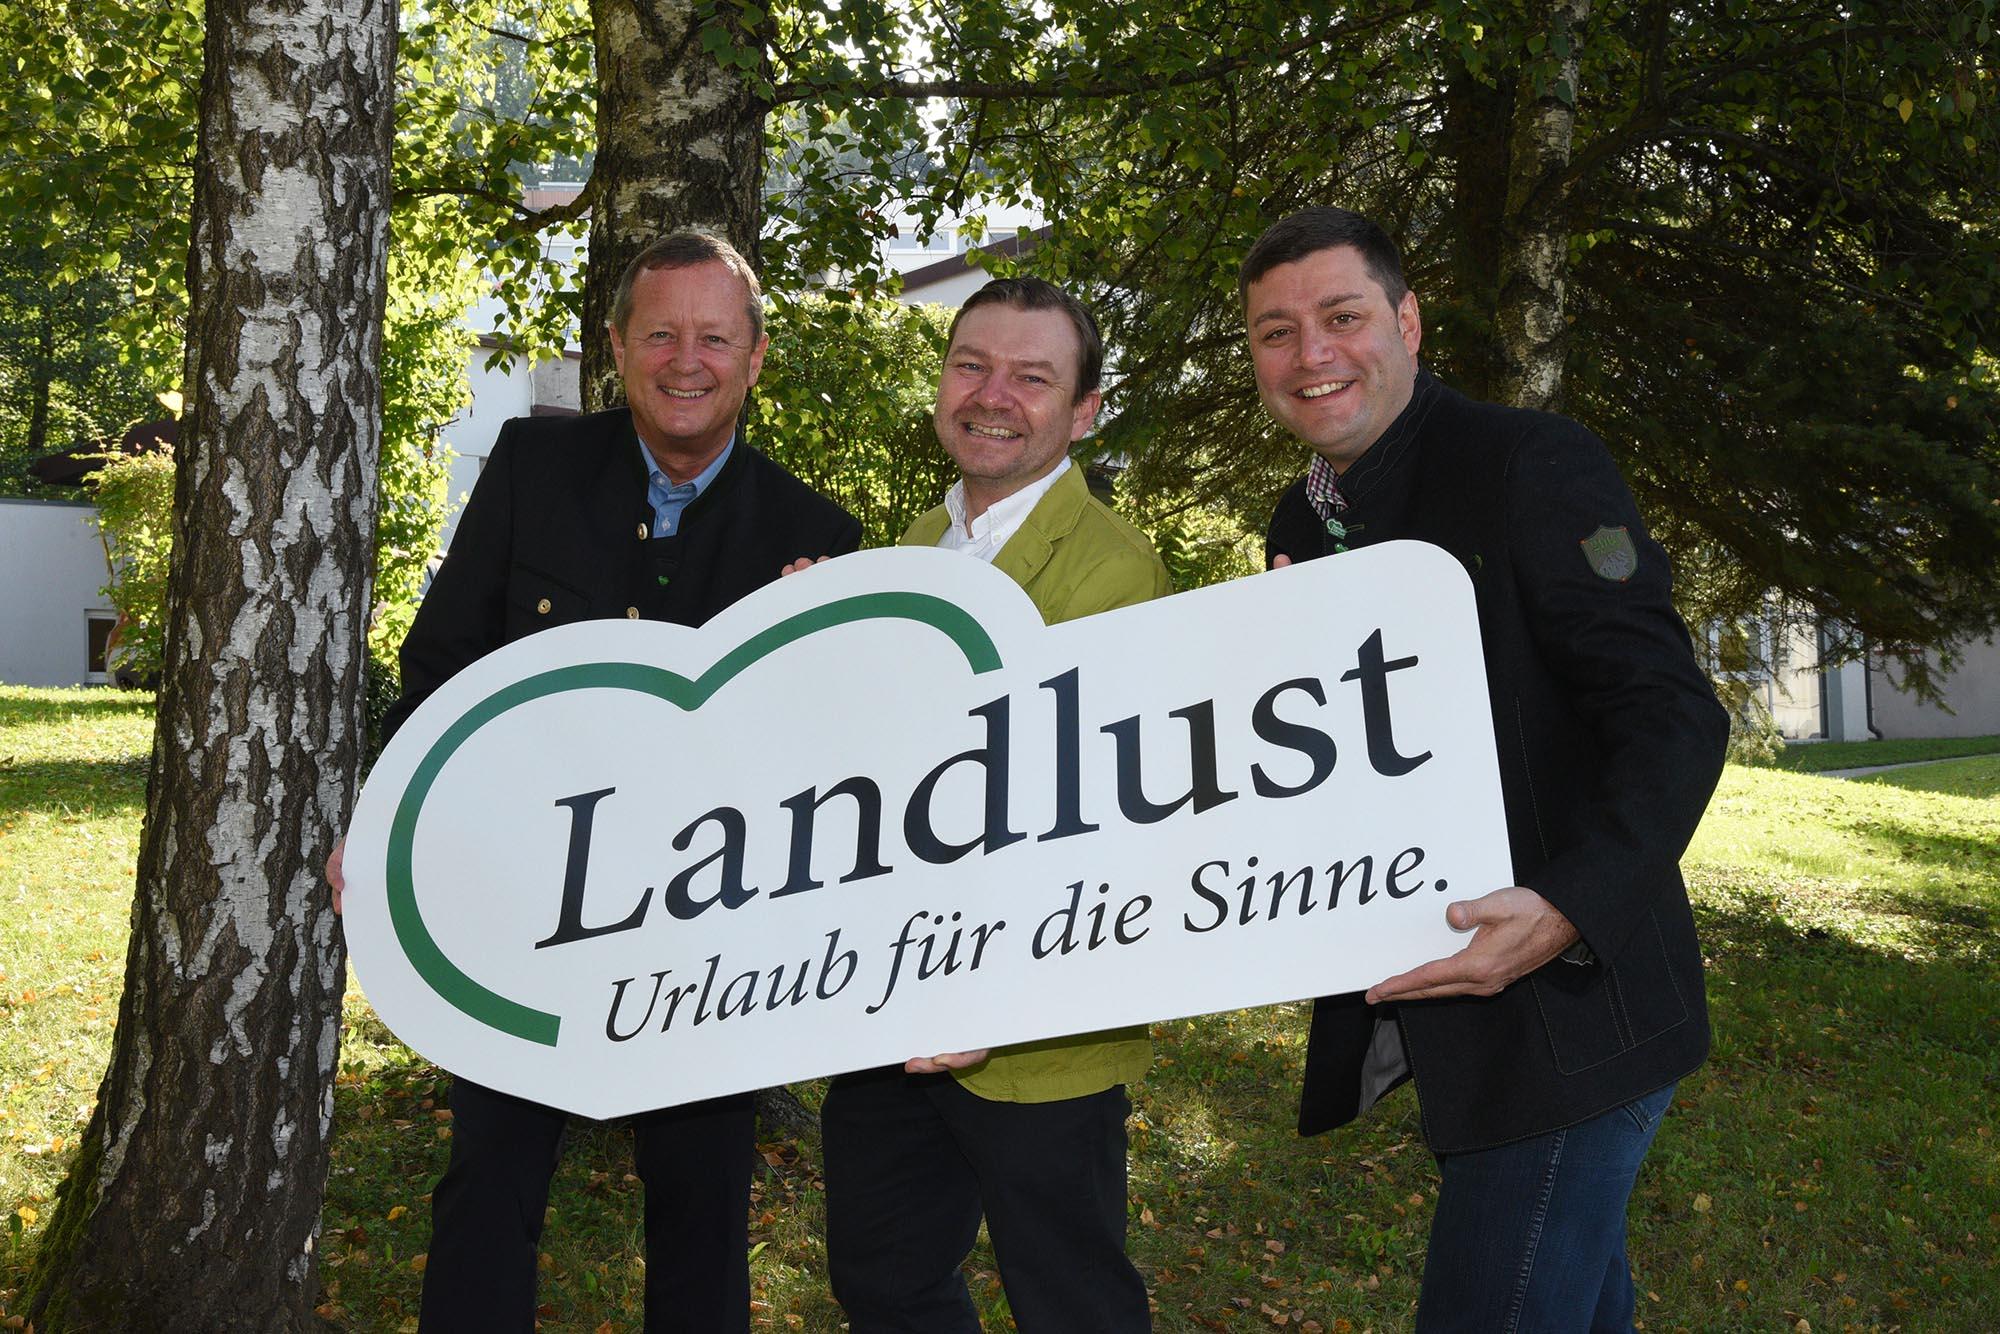 Landlust_Angebotsgruppe_Steiermark_neues Logo